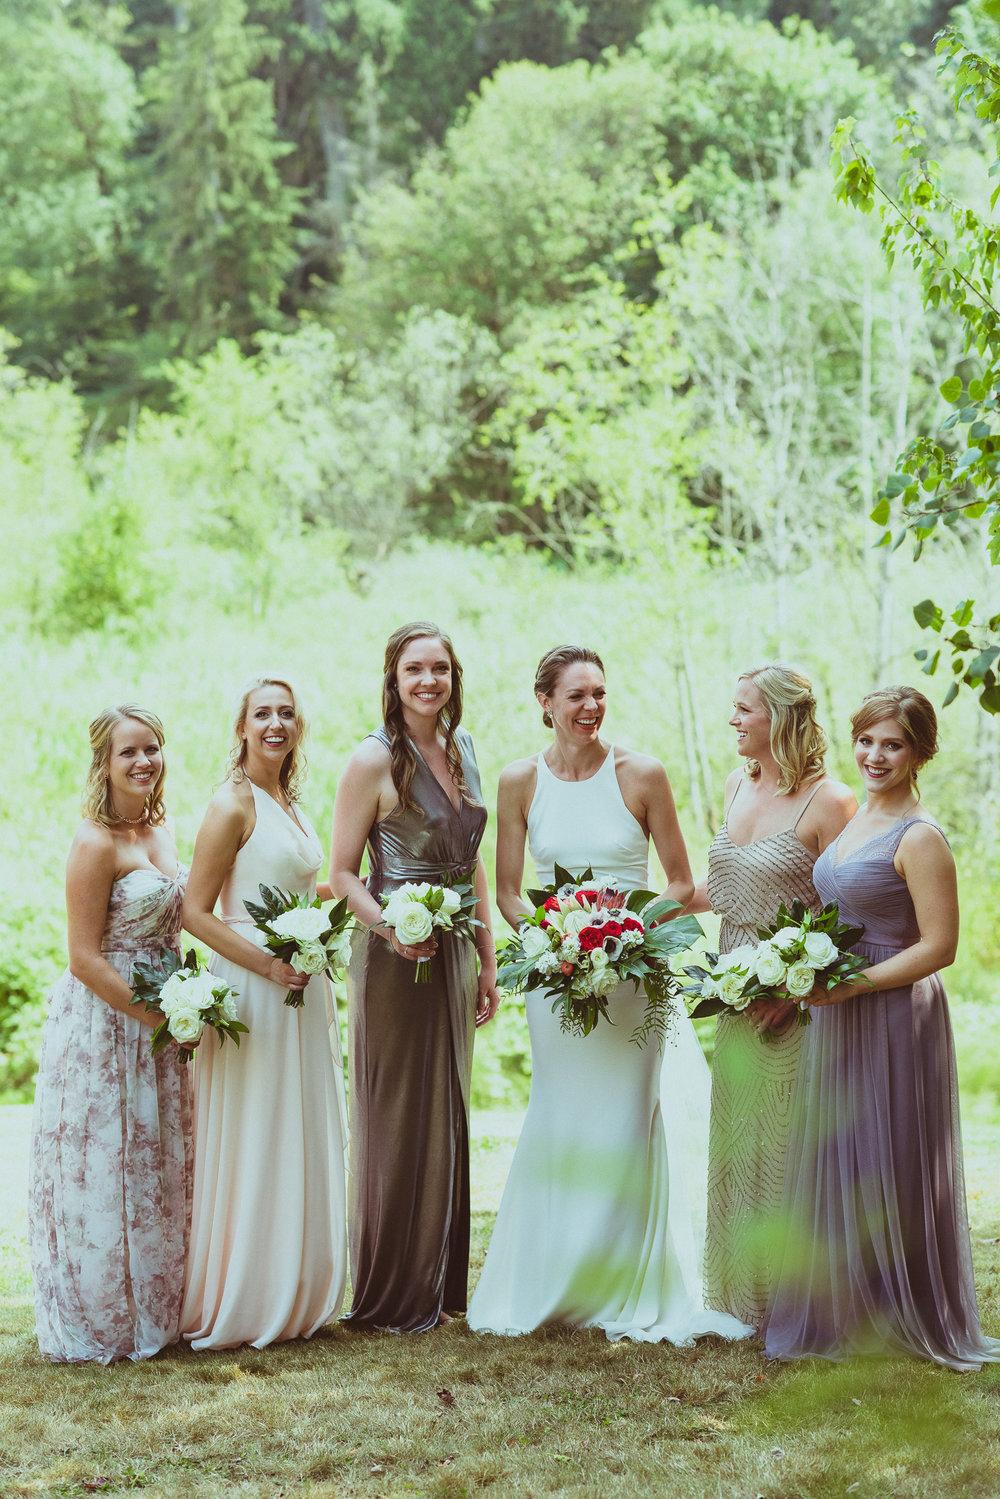 BEST_CHICAG_WEDDING_PHOTOGRAPHER_ZOE_RAIN_-38.jpg